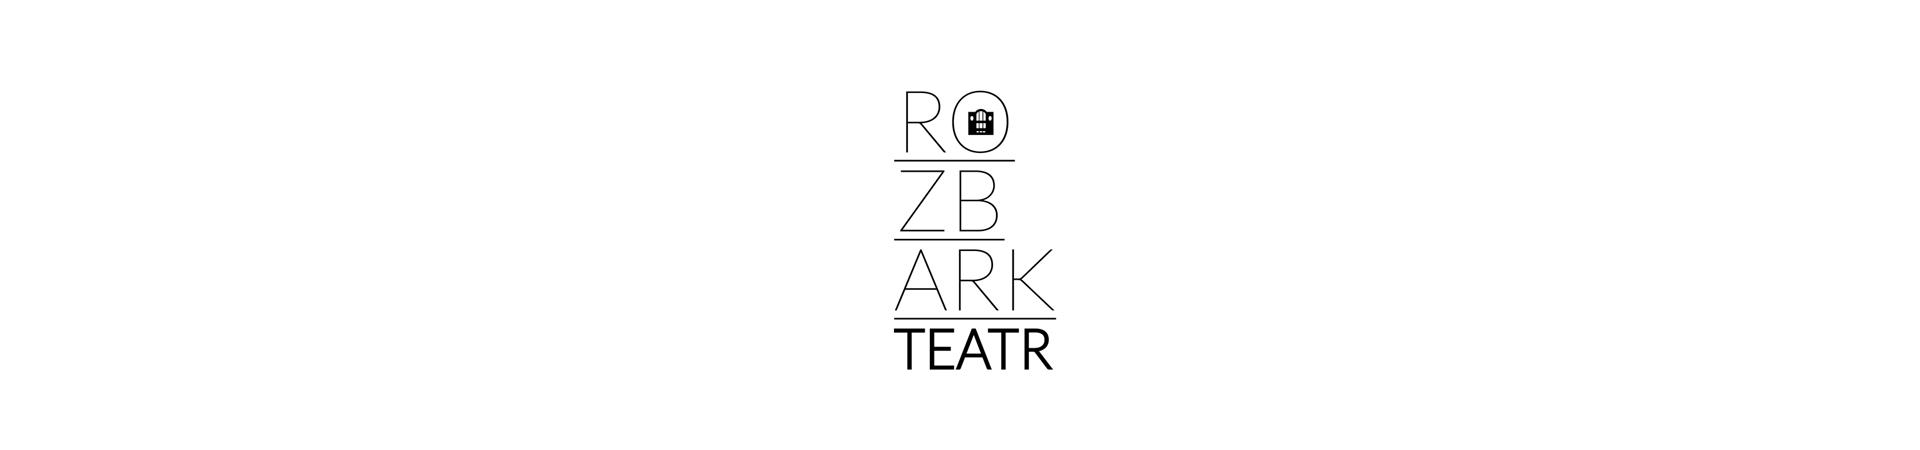 Rozbark-logo